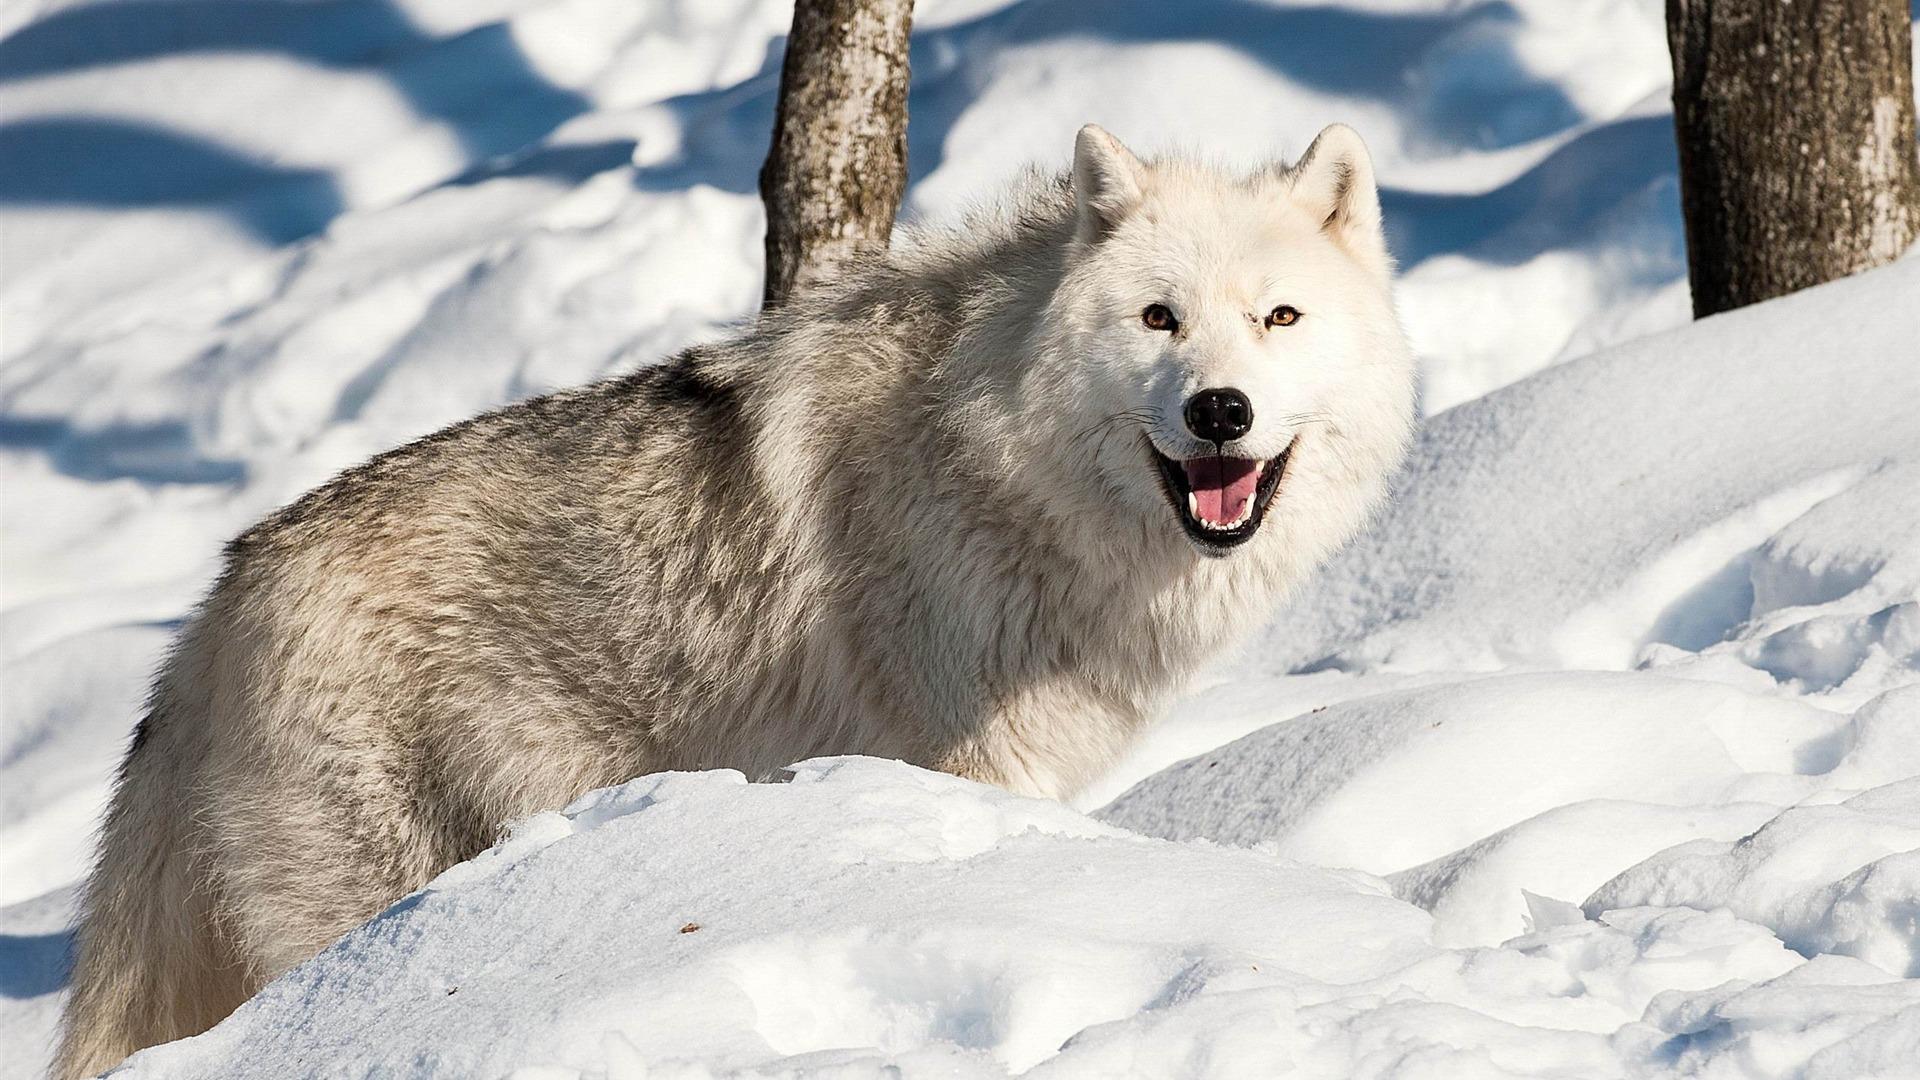 Dog Wolf Snow Winter Animal Hd Wallpaper Preview 10wallpaper Com